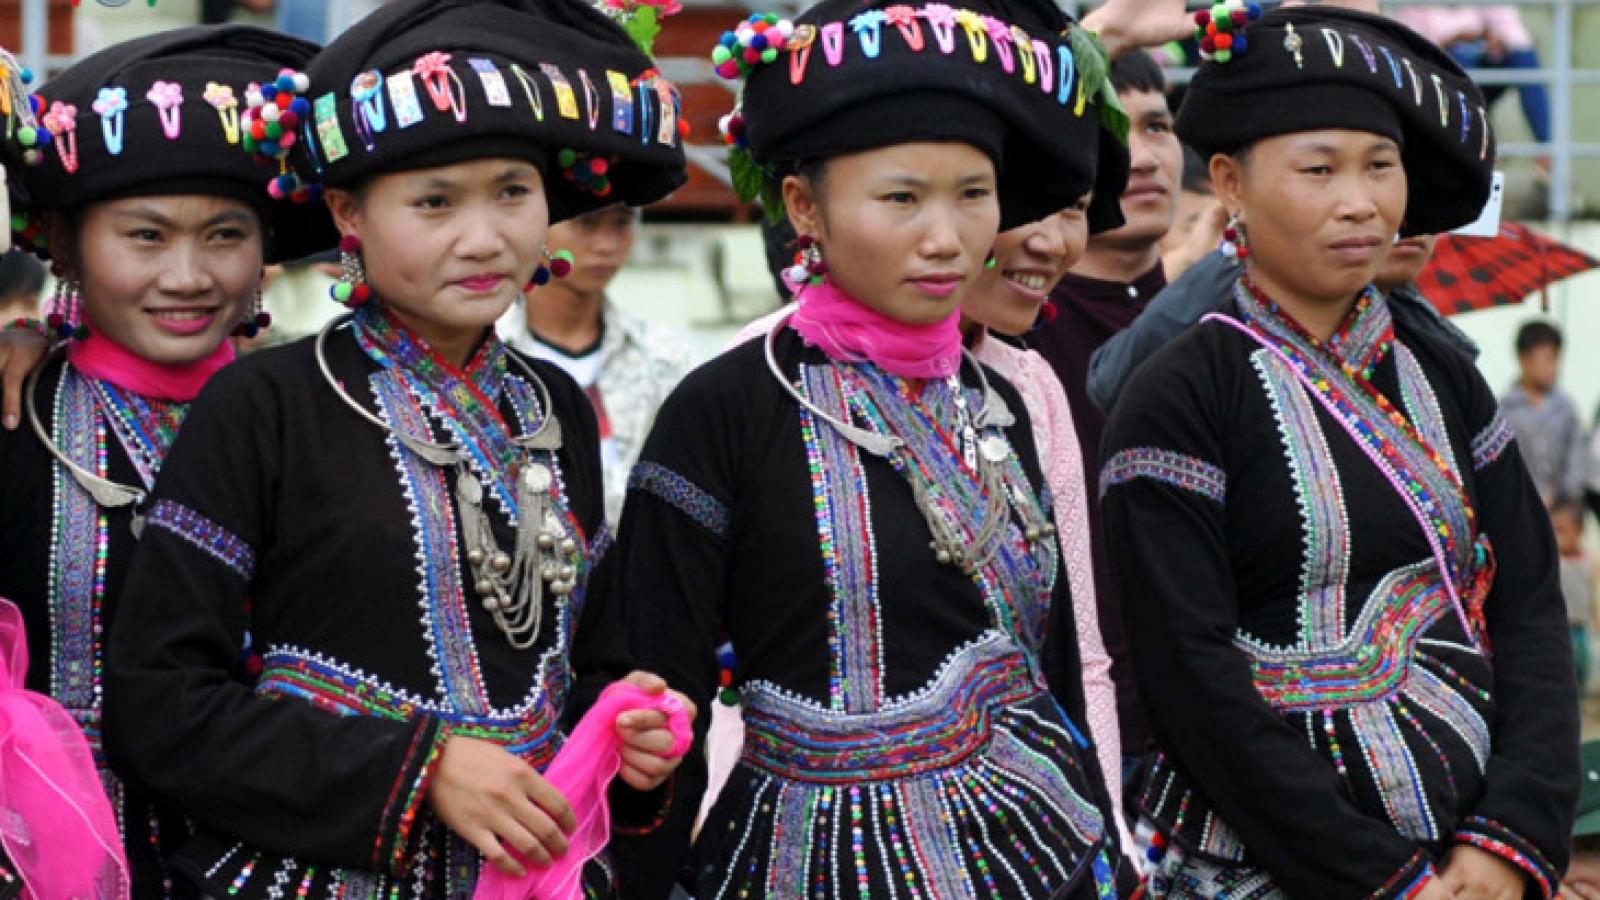 Traditional costumes of the Lu ethnic minority